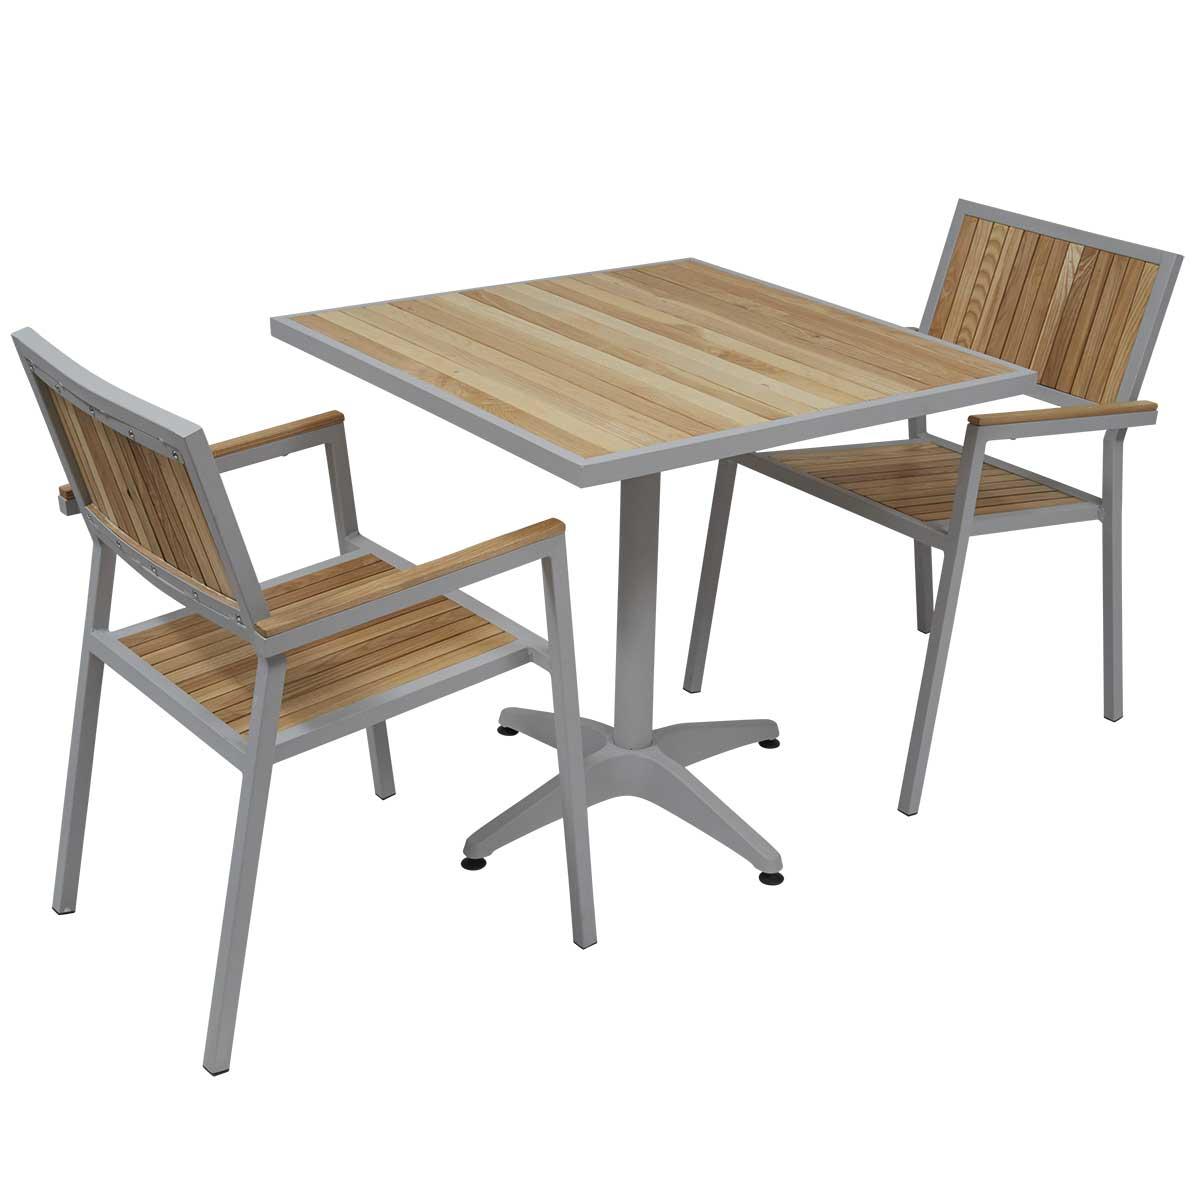 Table De Jardin En solde Génial Table Terrasse Pas Cher Of 34 Luxe Table De Jardin En solde